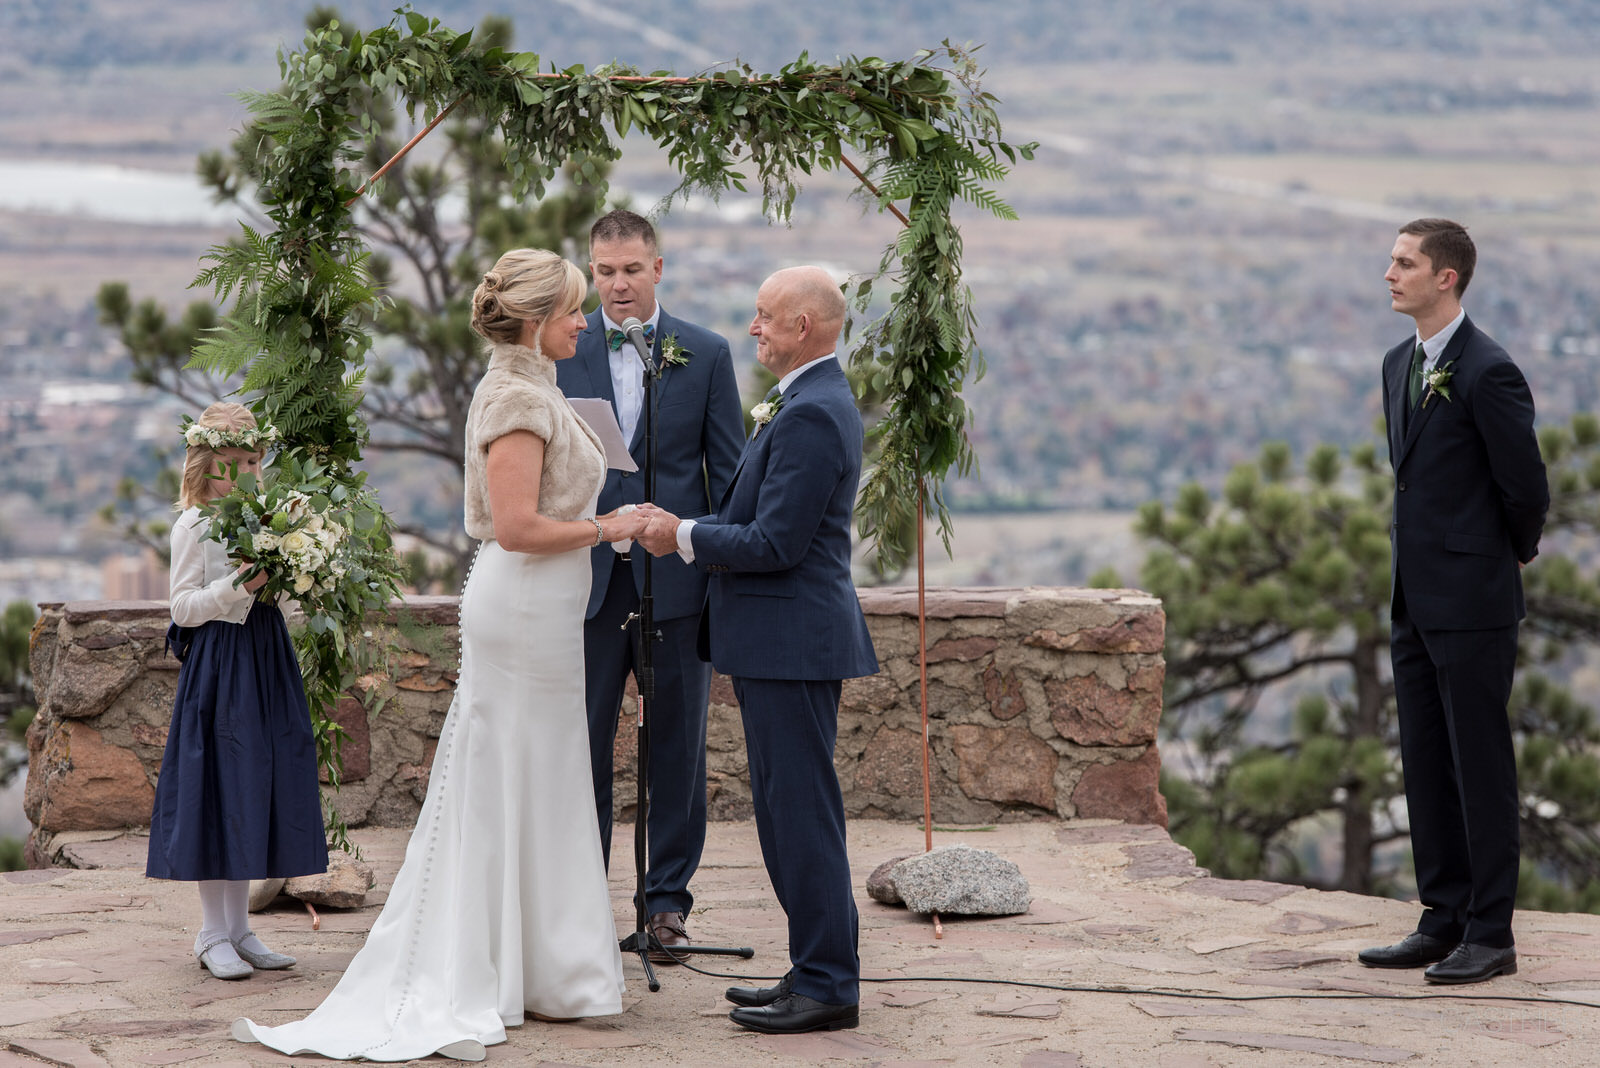 boulder wedding photographers flagstaff chautauqua